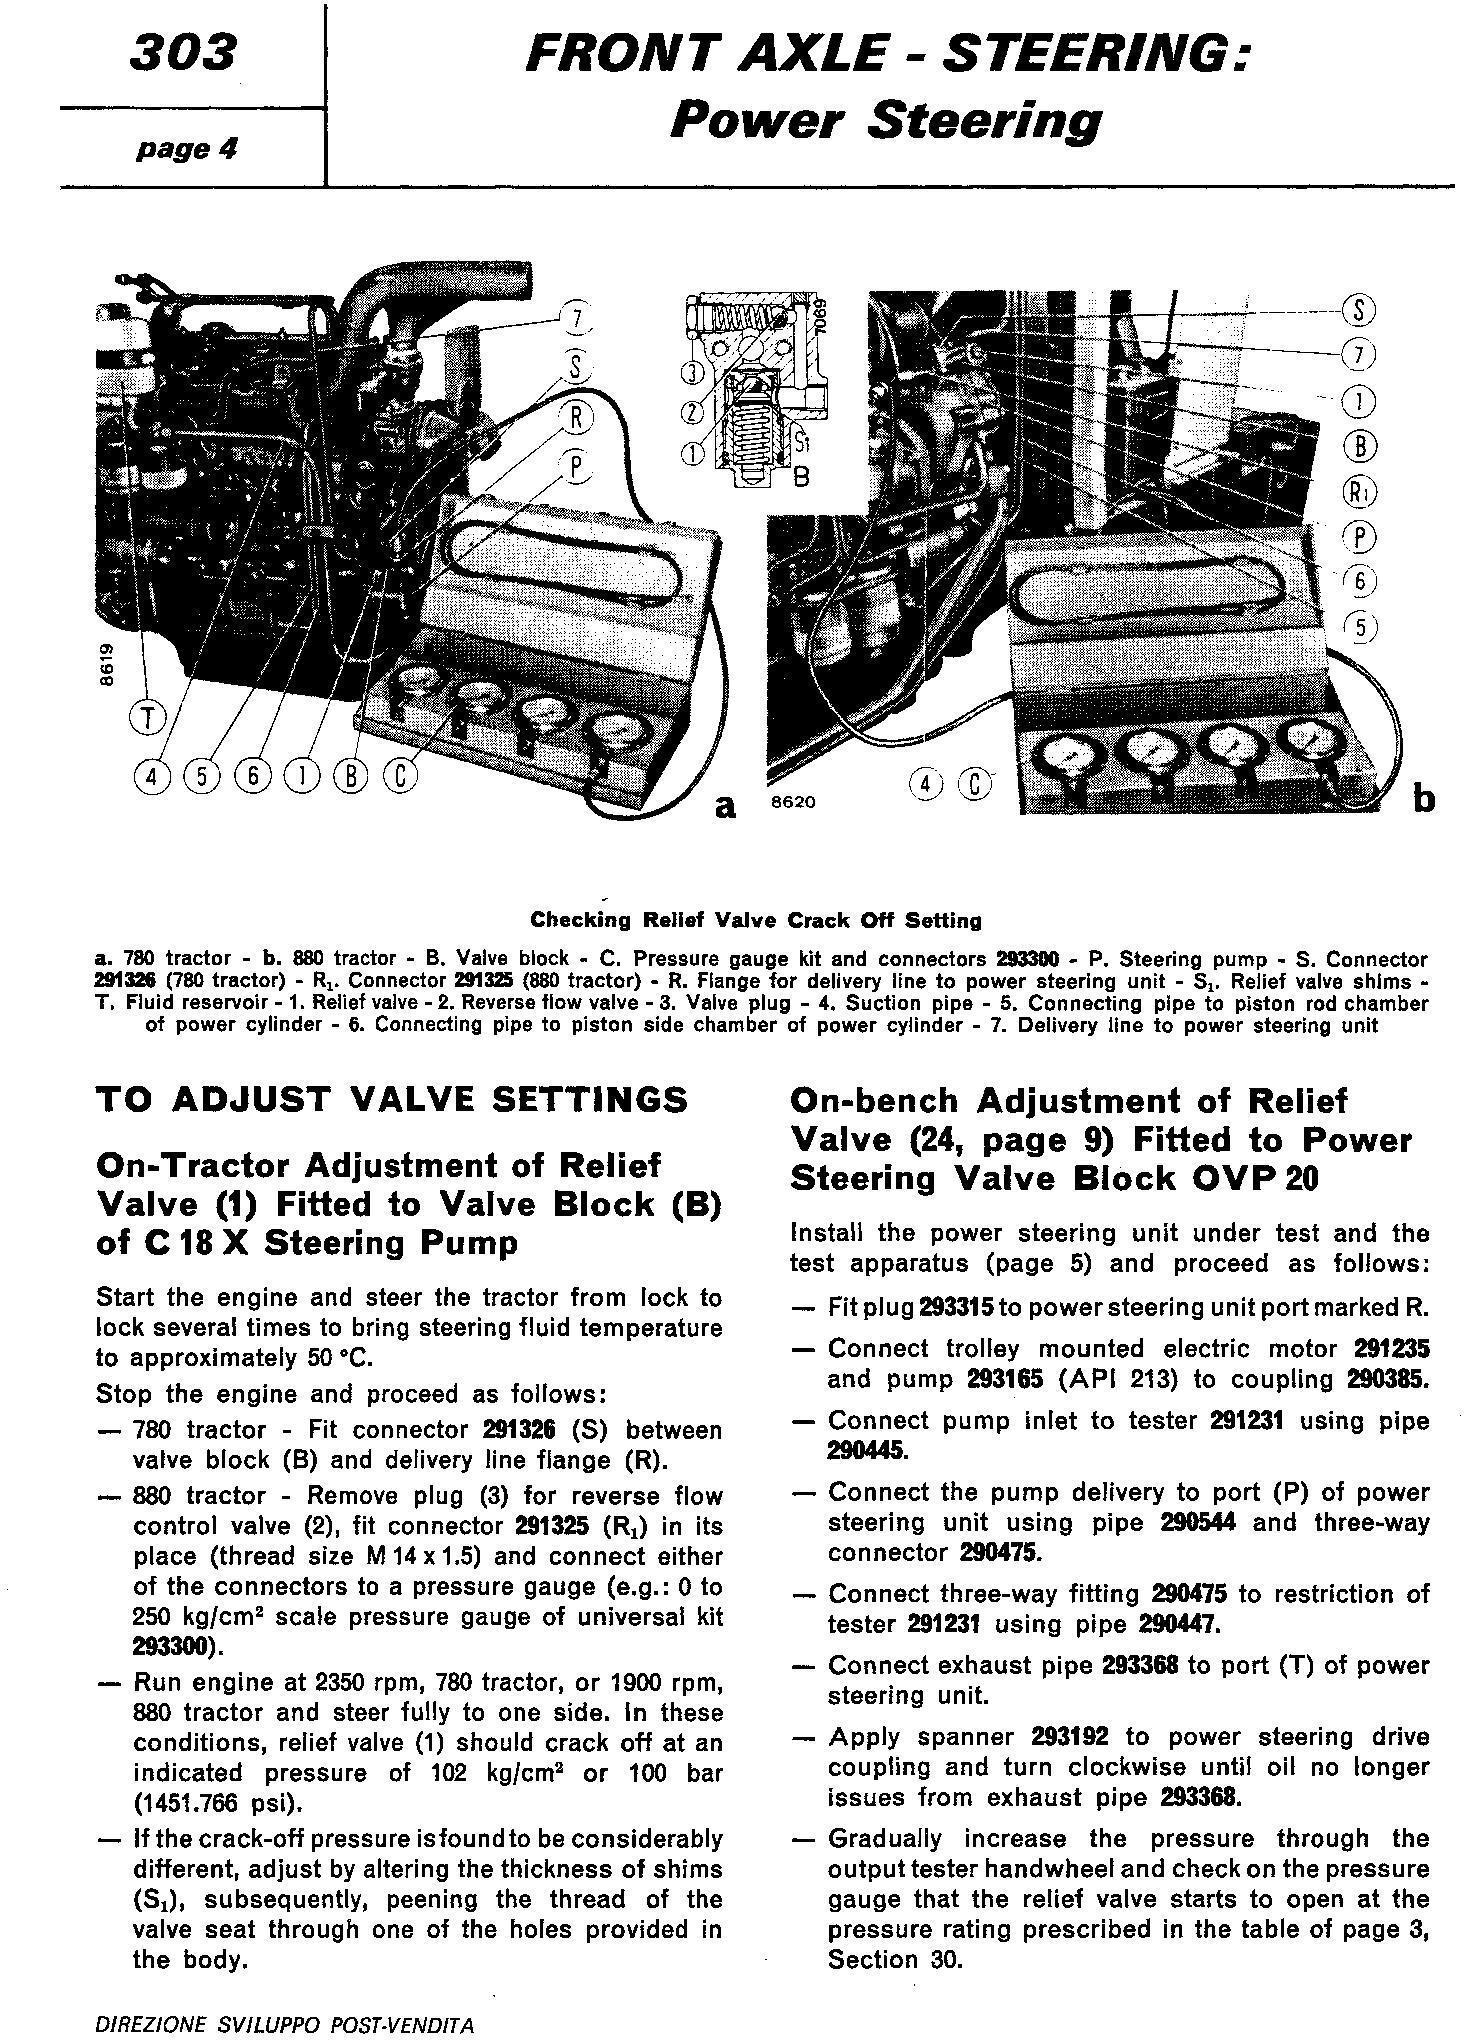 Fiat 780, 780DT, 880, 880DT Tractor Workshop Service Manual (6035420100) - 2